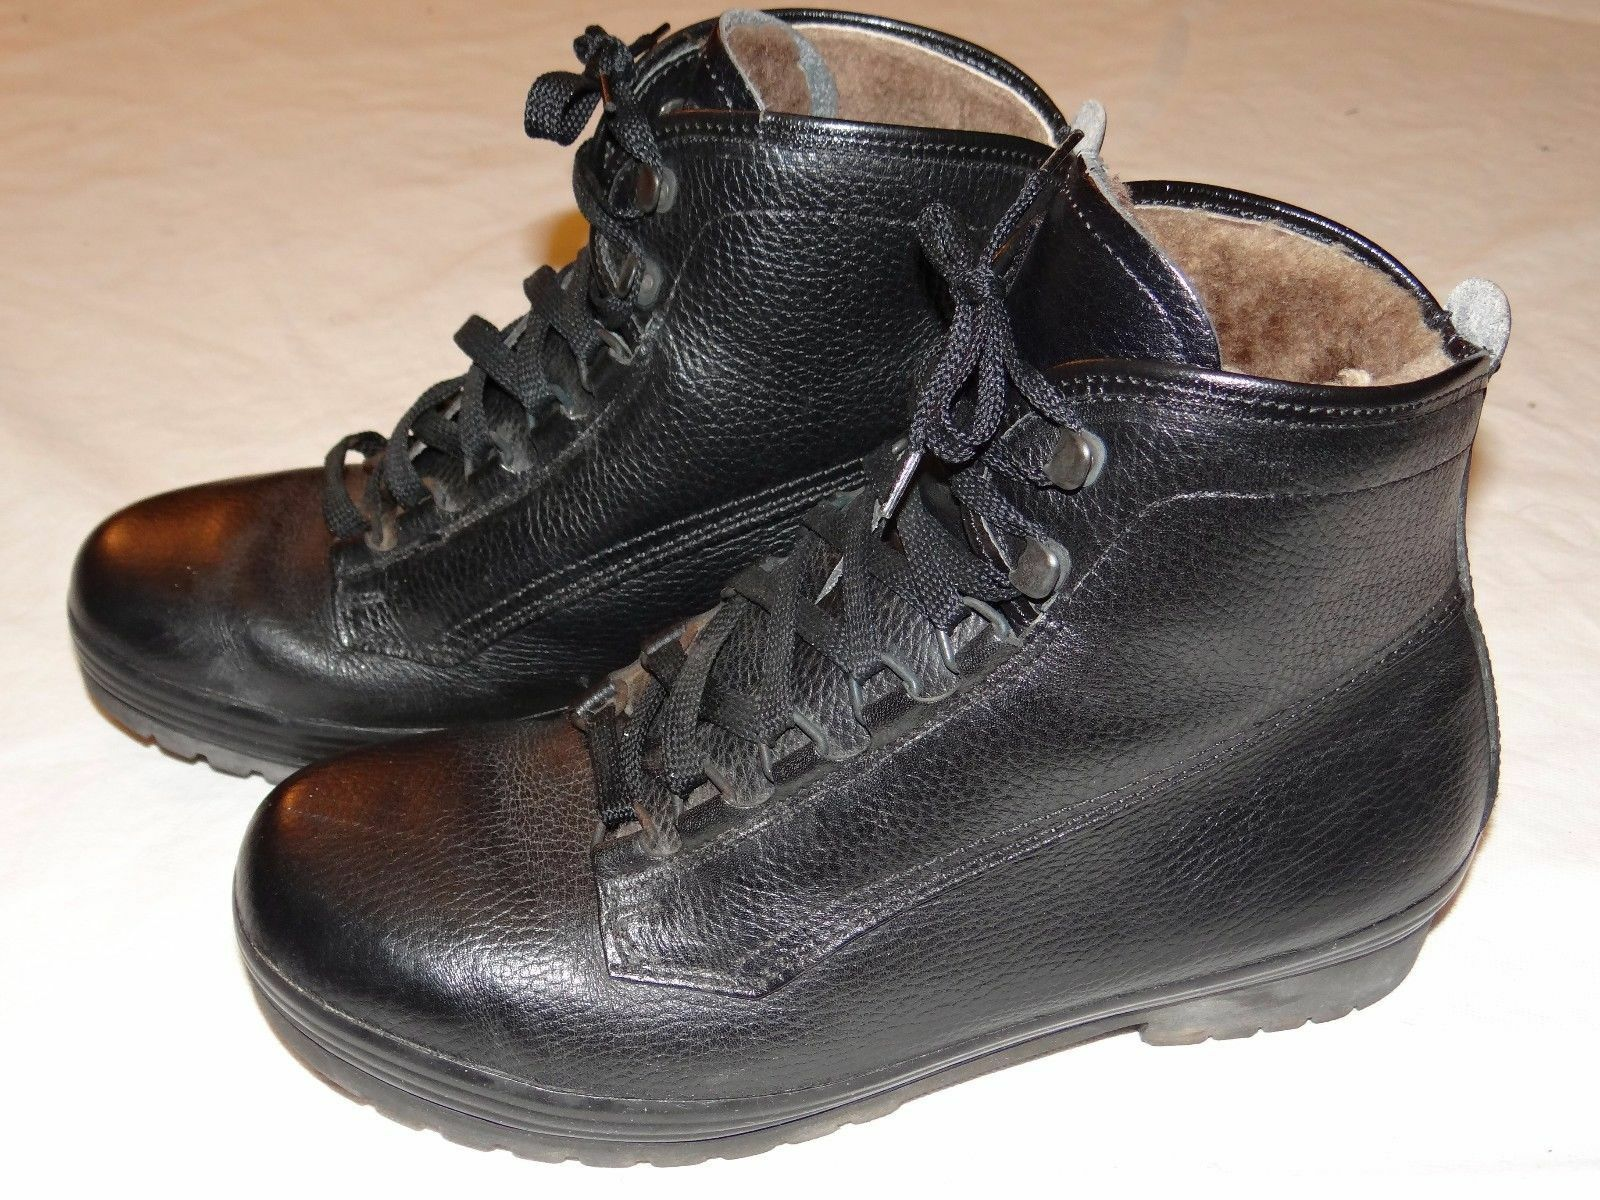 Lowa Wanderschuhe Gr Stiefel Leder Schuhe Boots Gr Wanderschuhe 8,5 gefüttert schwarz 816bfd